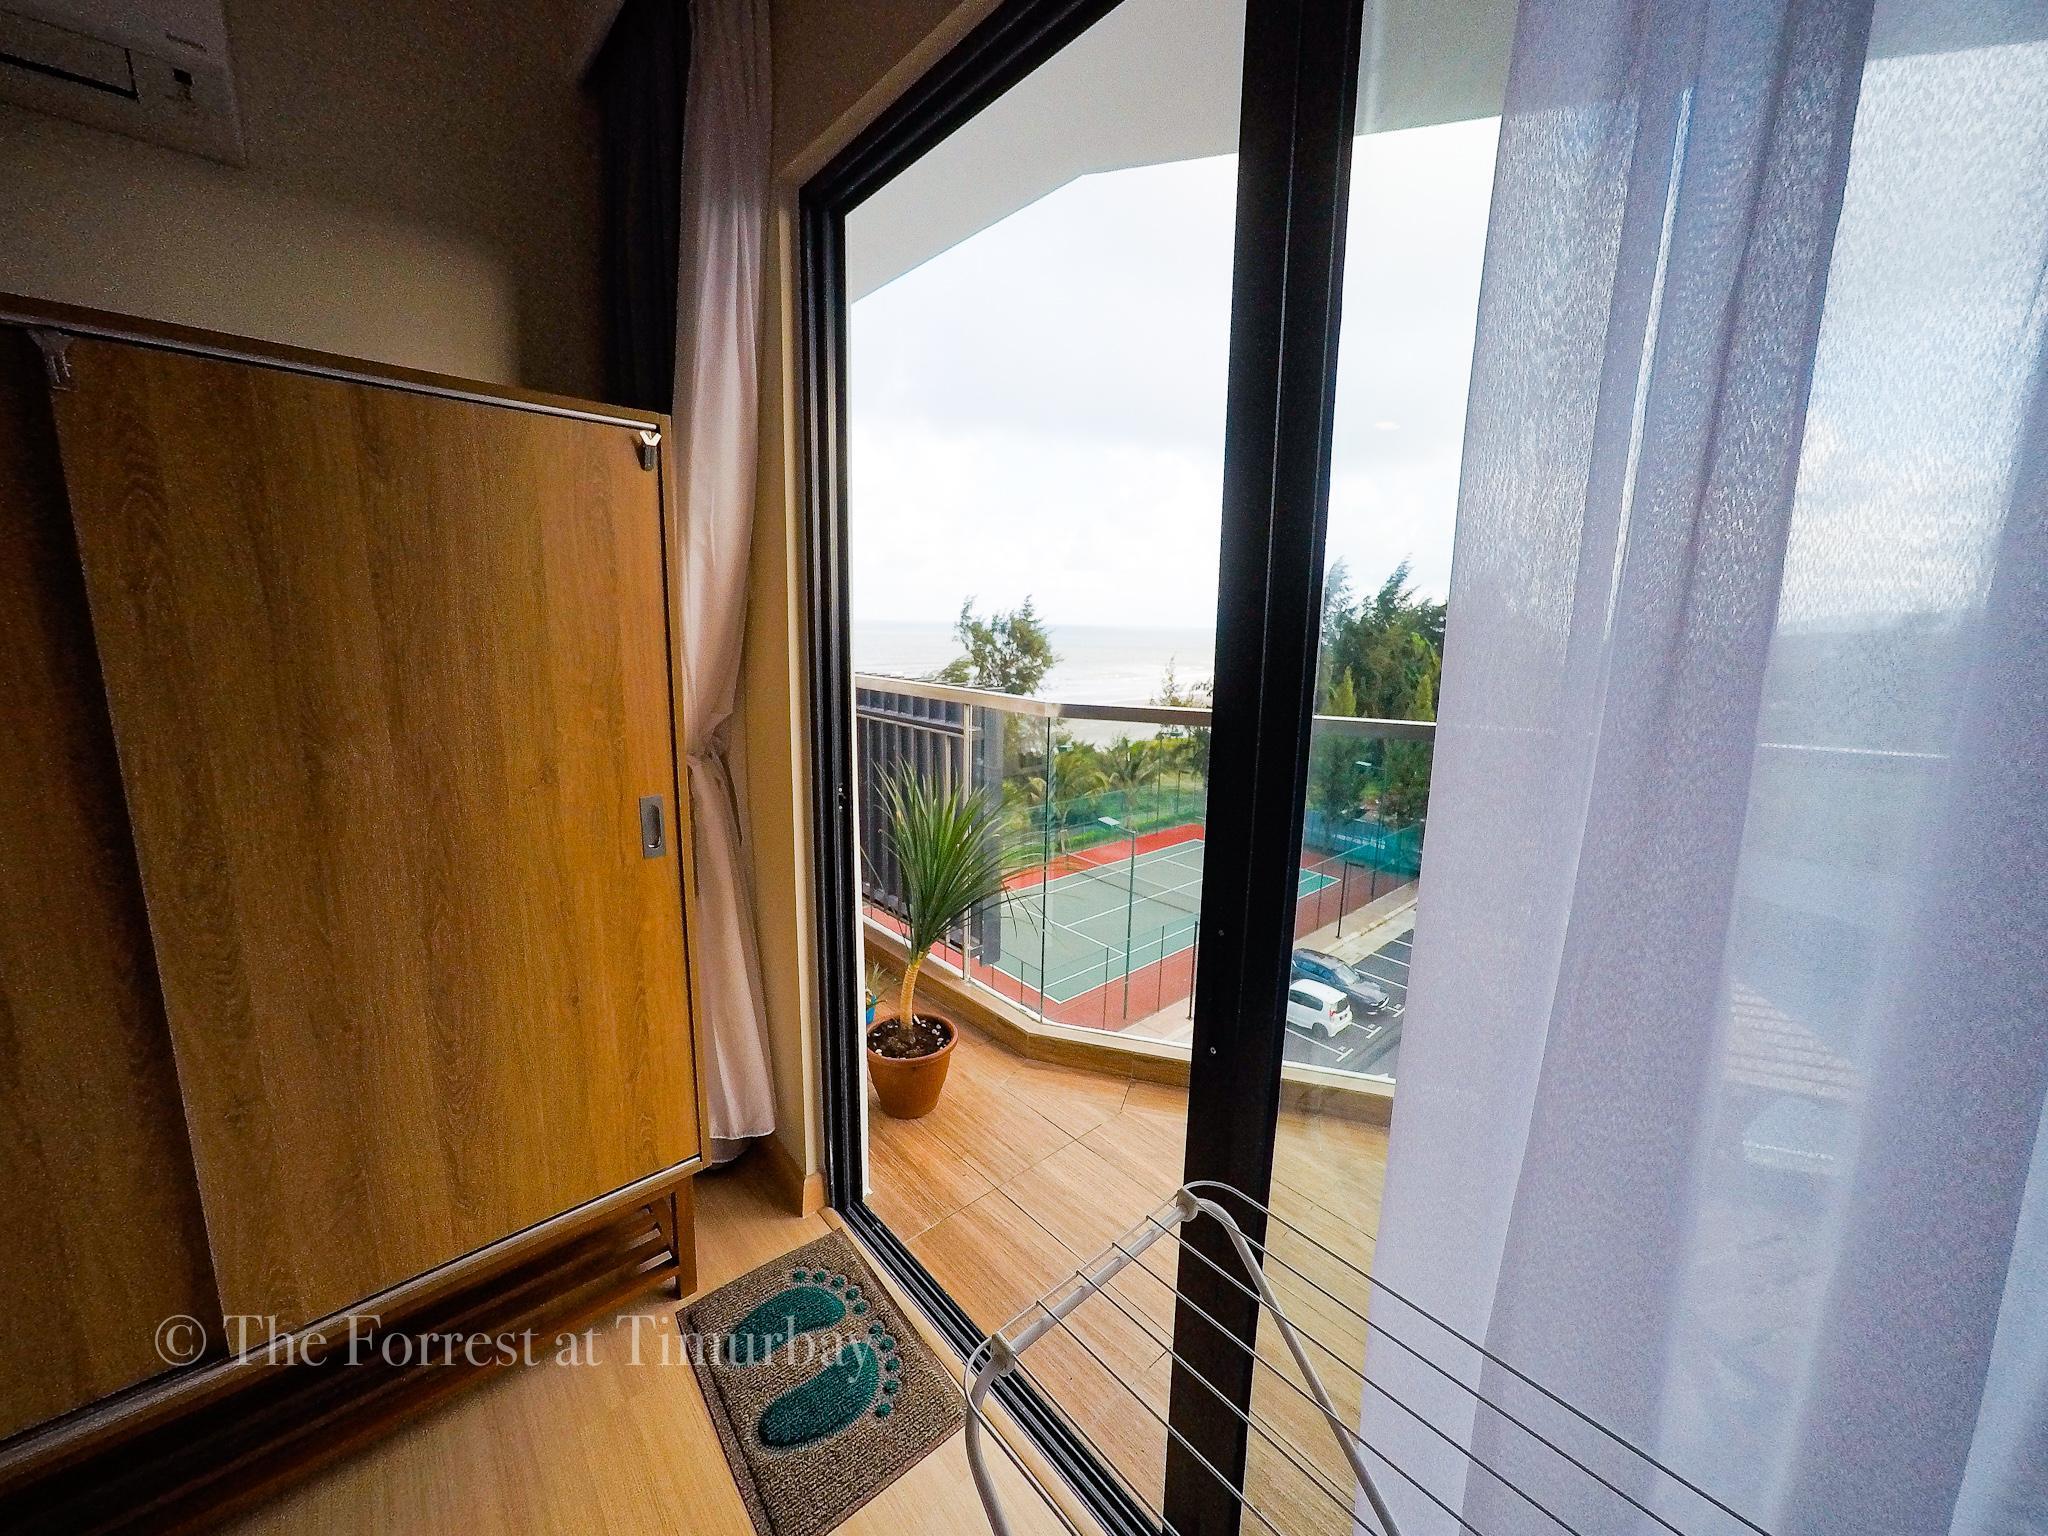 The Forrest Greenery Seaview Cozy Studio TimurBay